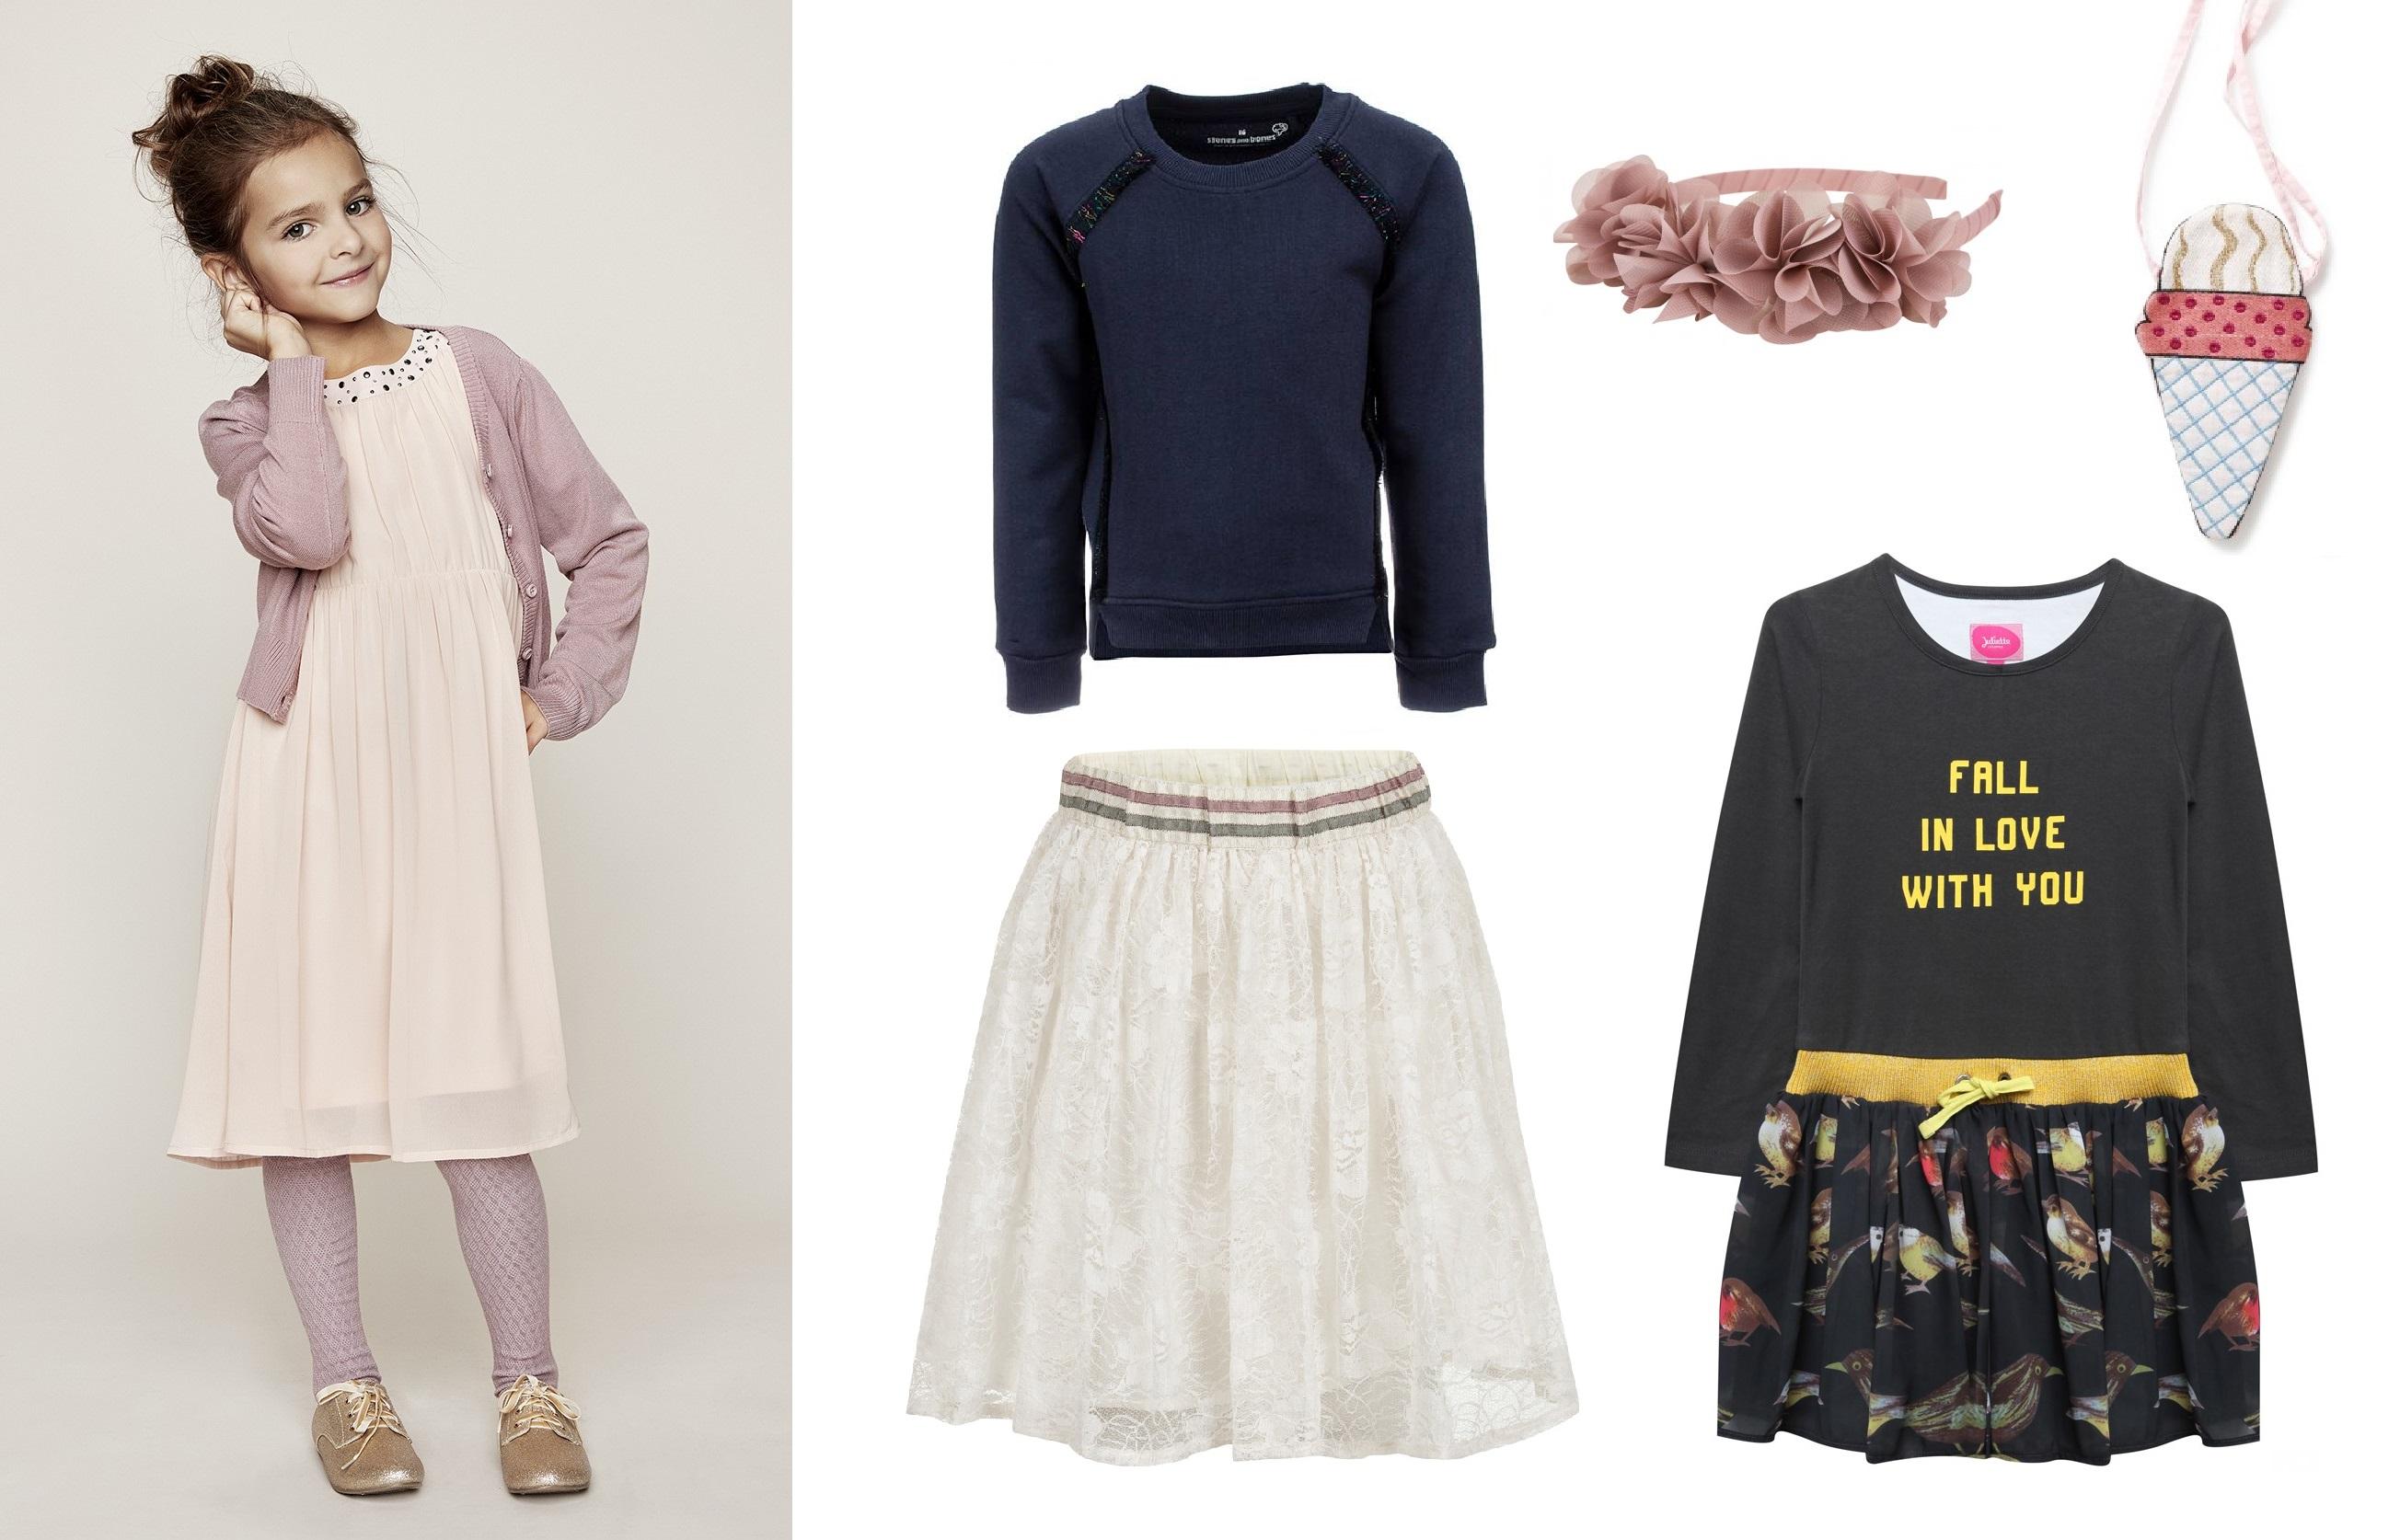 meisjes wintercollectie outfit inspiratie